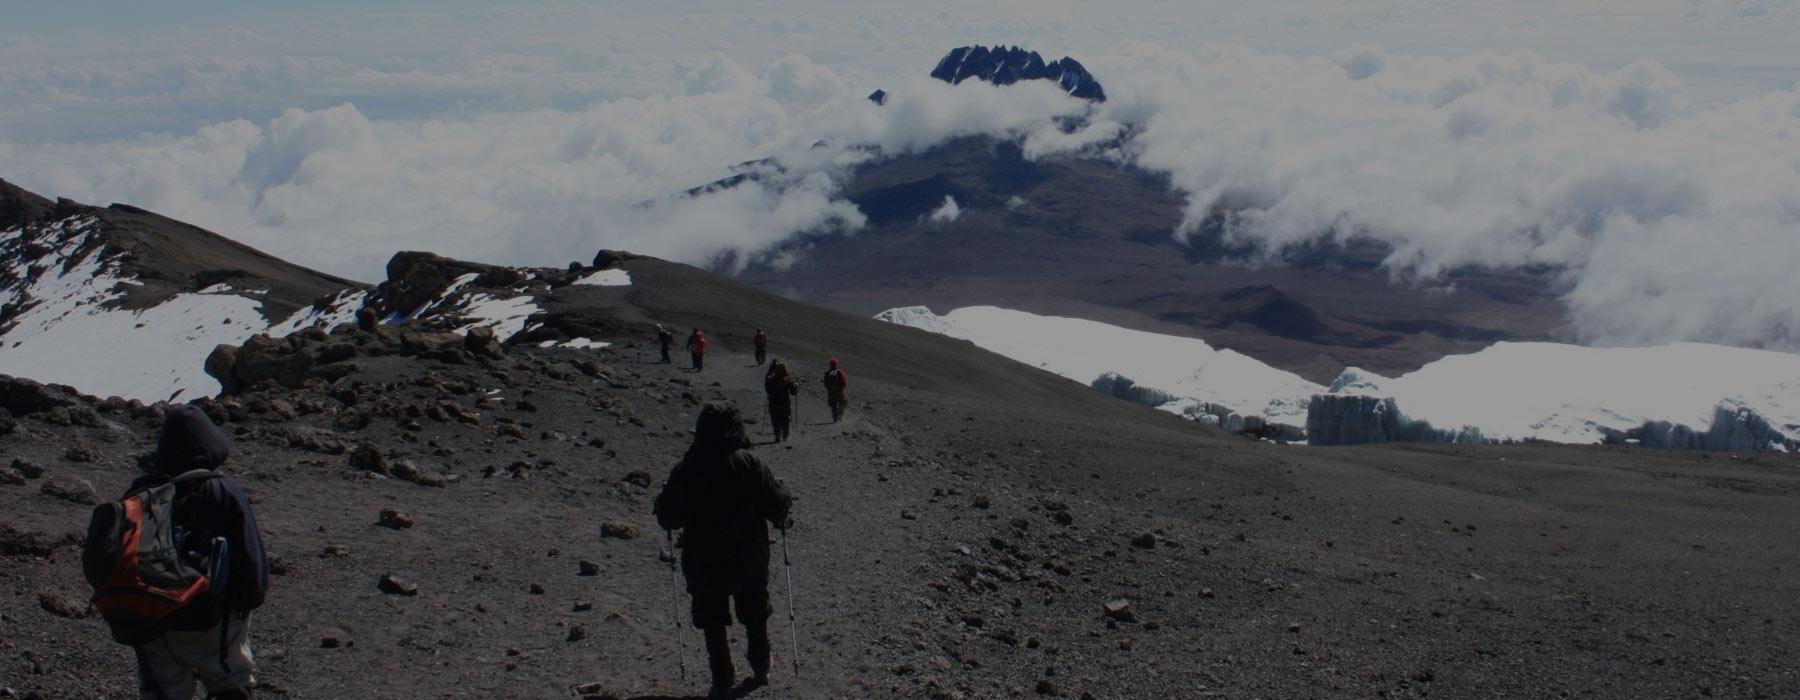 A Typical Day When Climbing Kilimanjaro